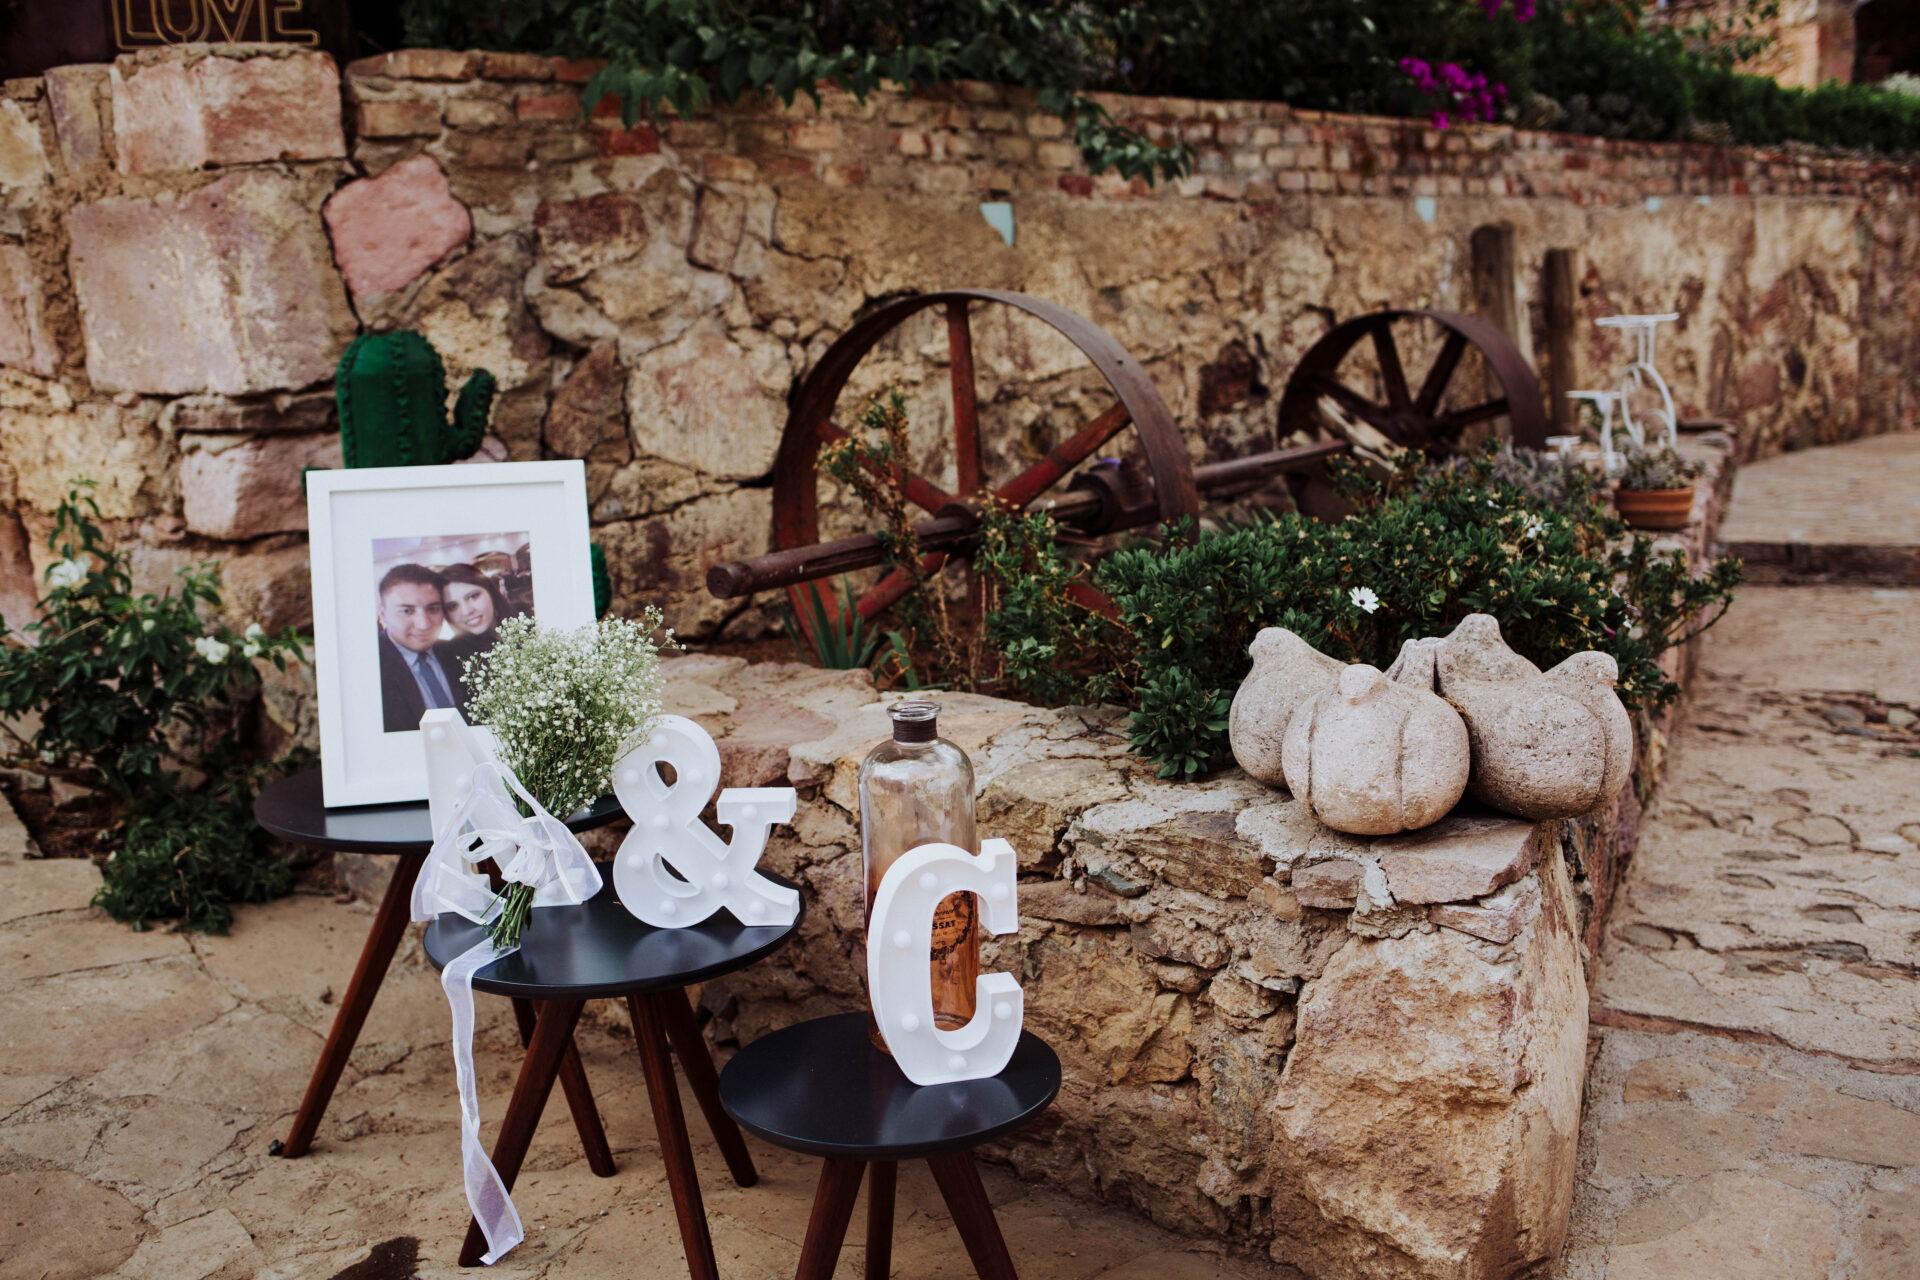 javier_noriega_fotografo_bodas_exhacienda_las_mercedes_zacatecas_wedding_photographer7a